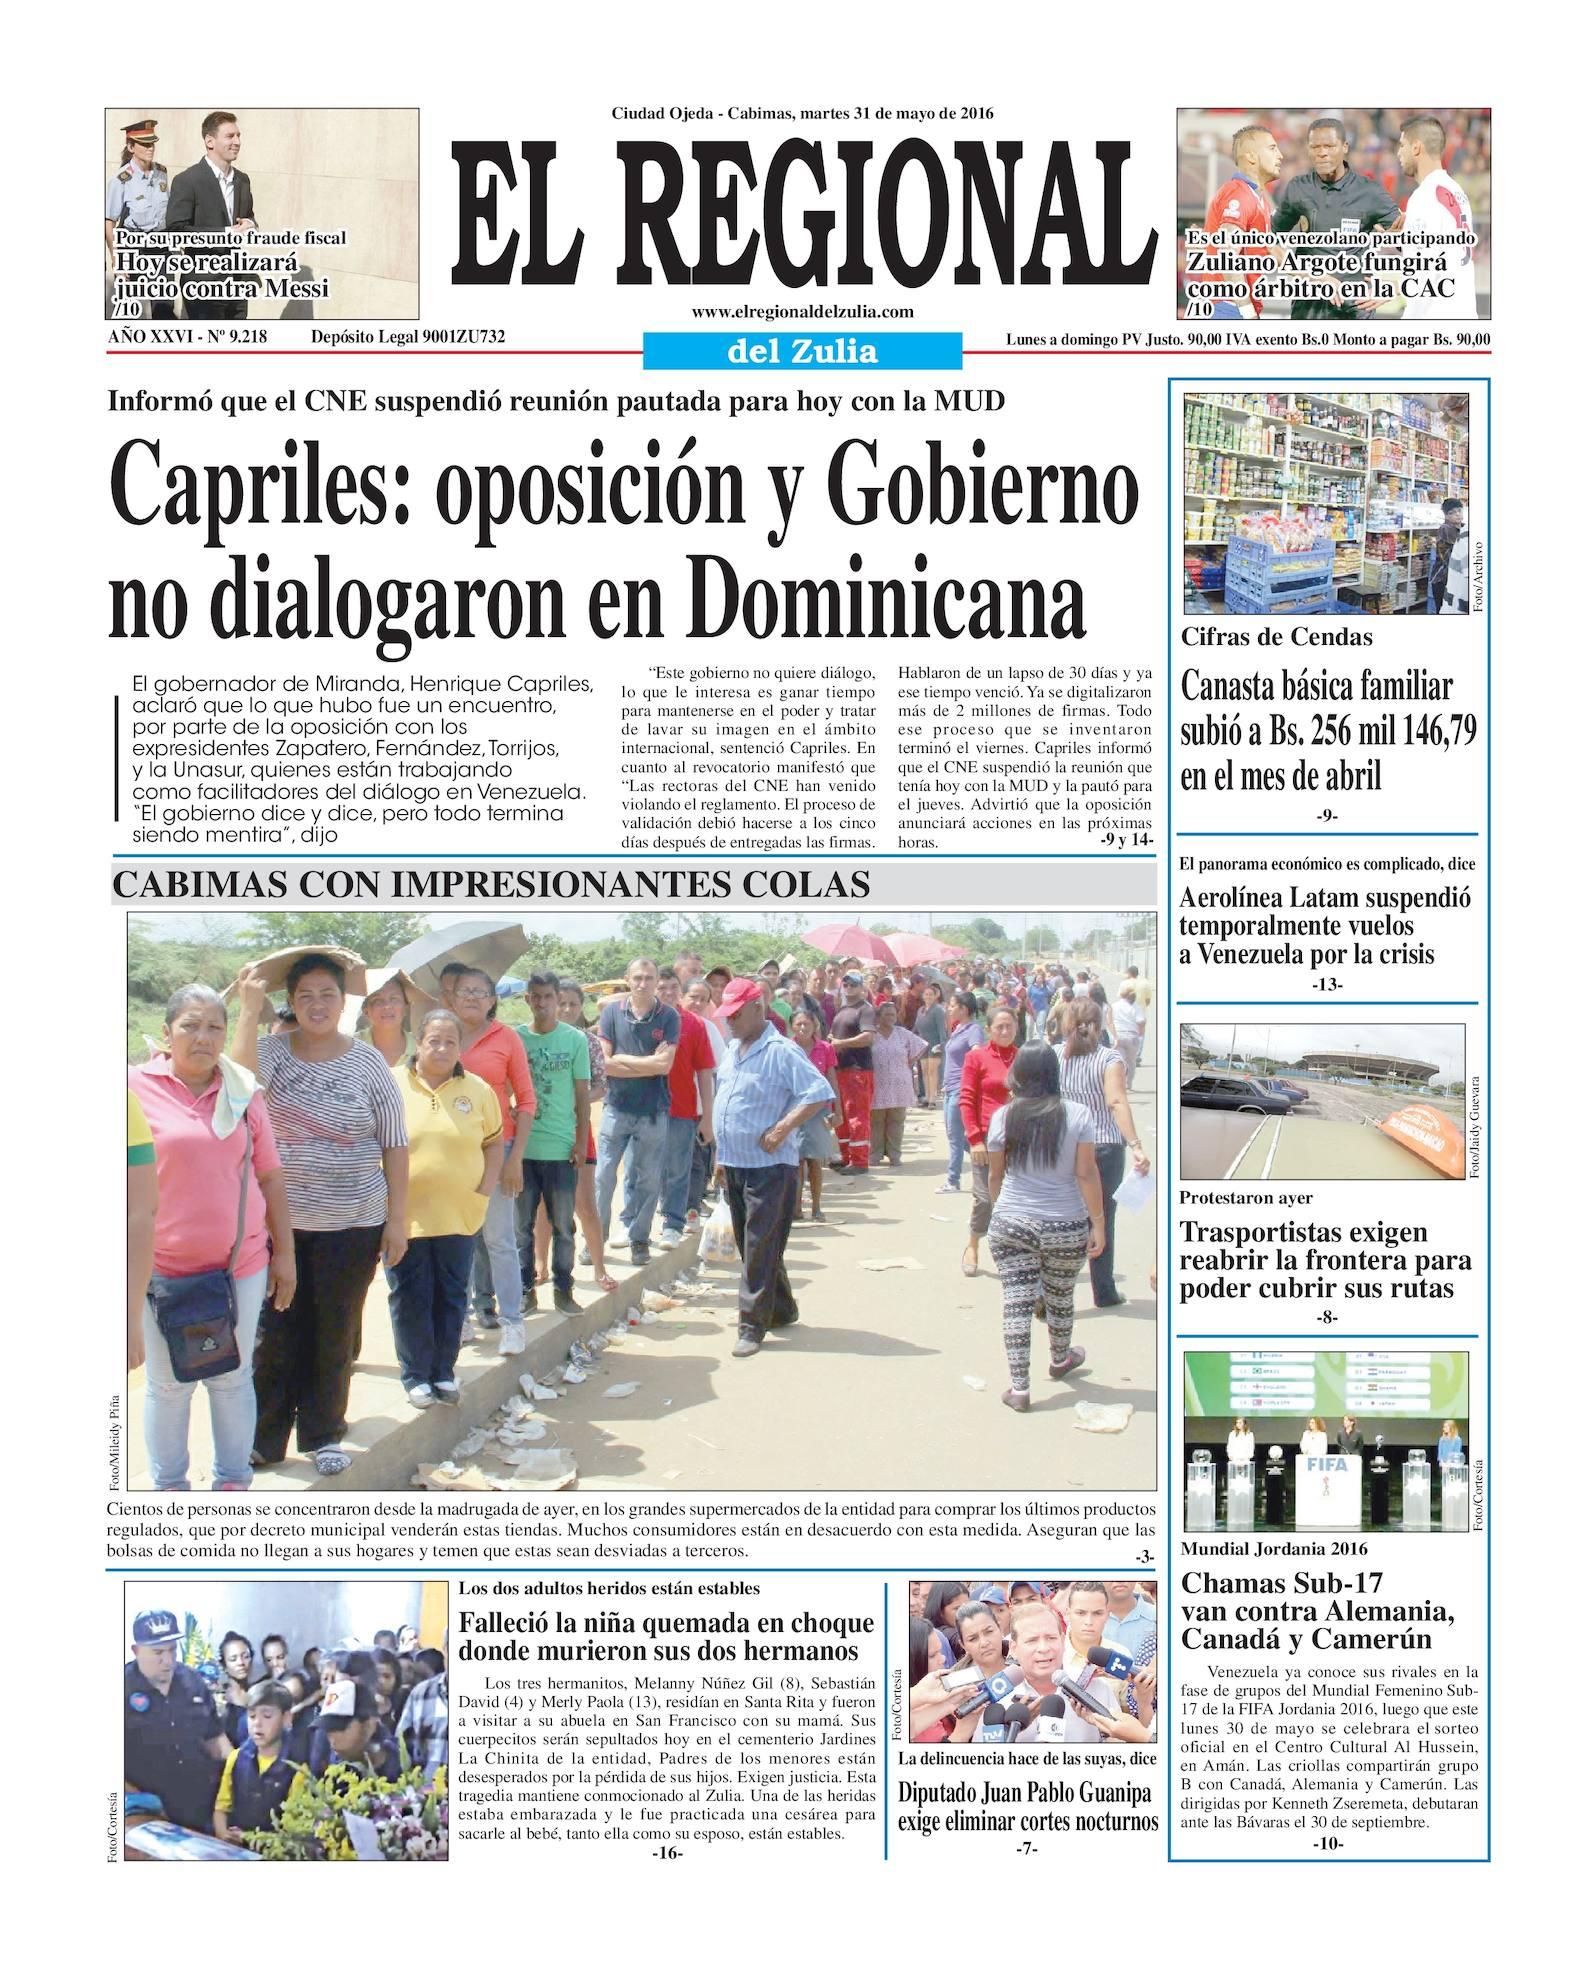 Calaméo - El Regional del Zulia 31-05-2016